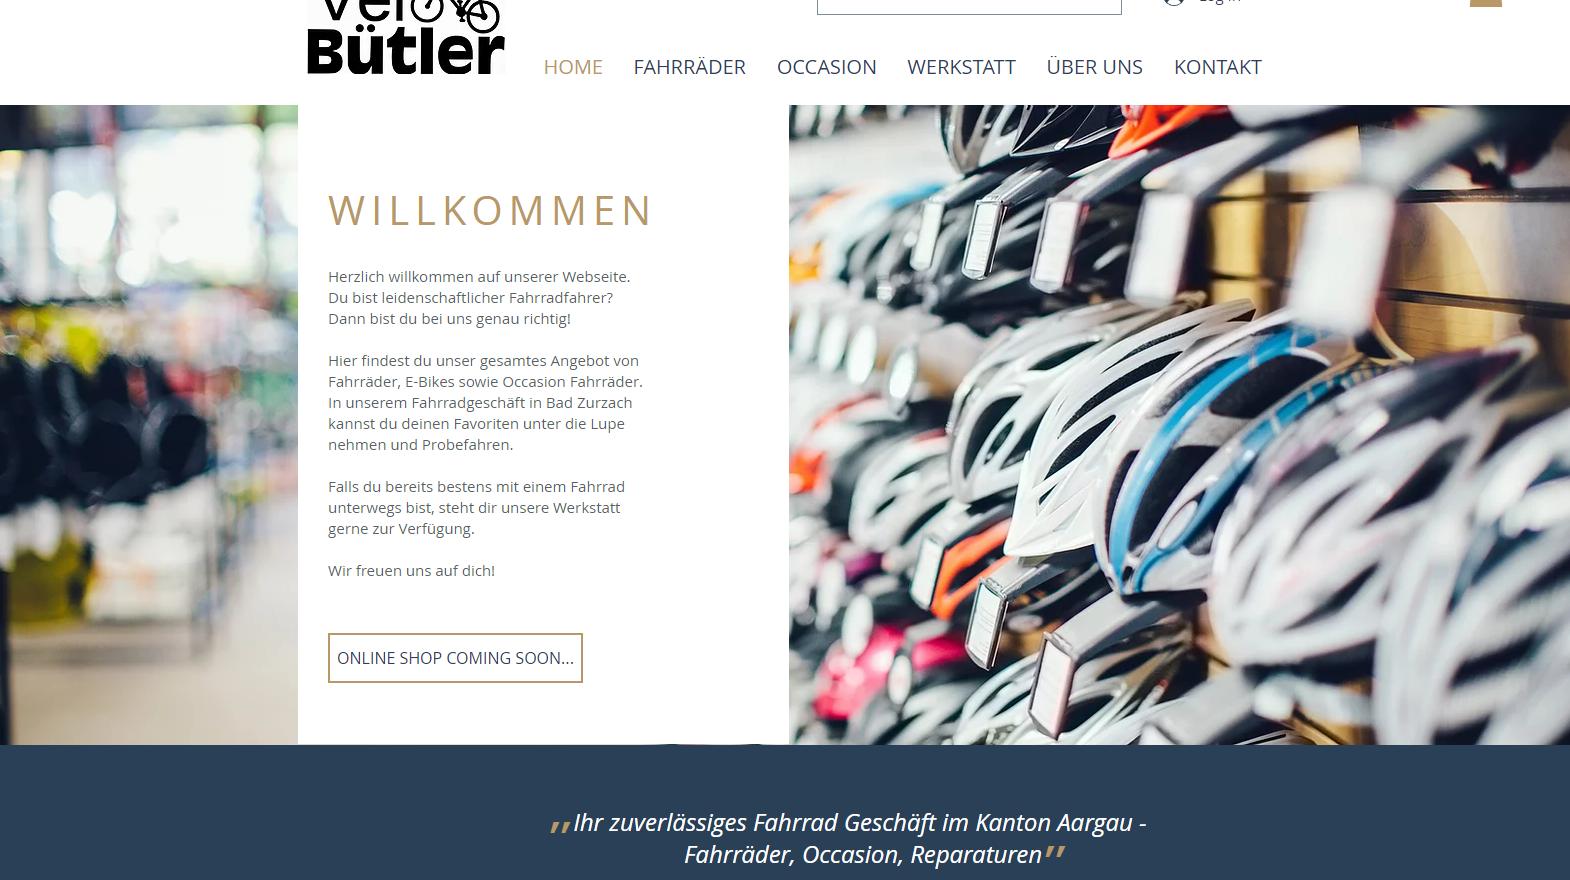 Velo Bütler - Online Shop coming soon...